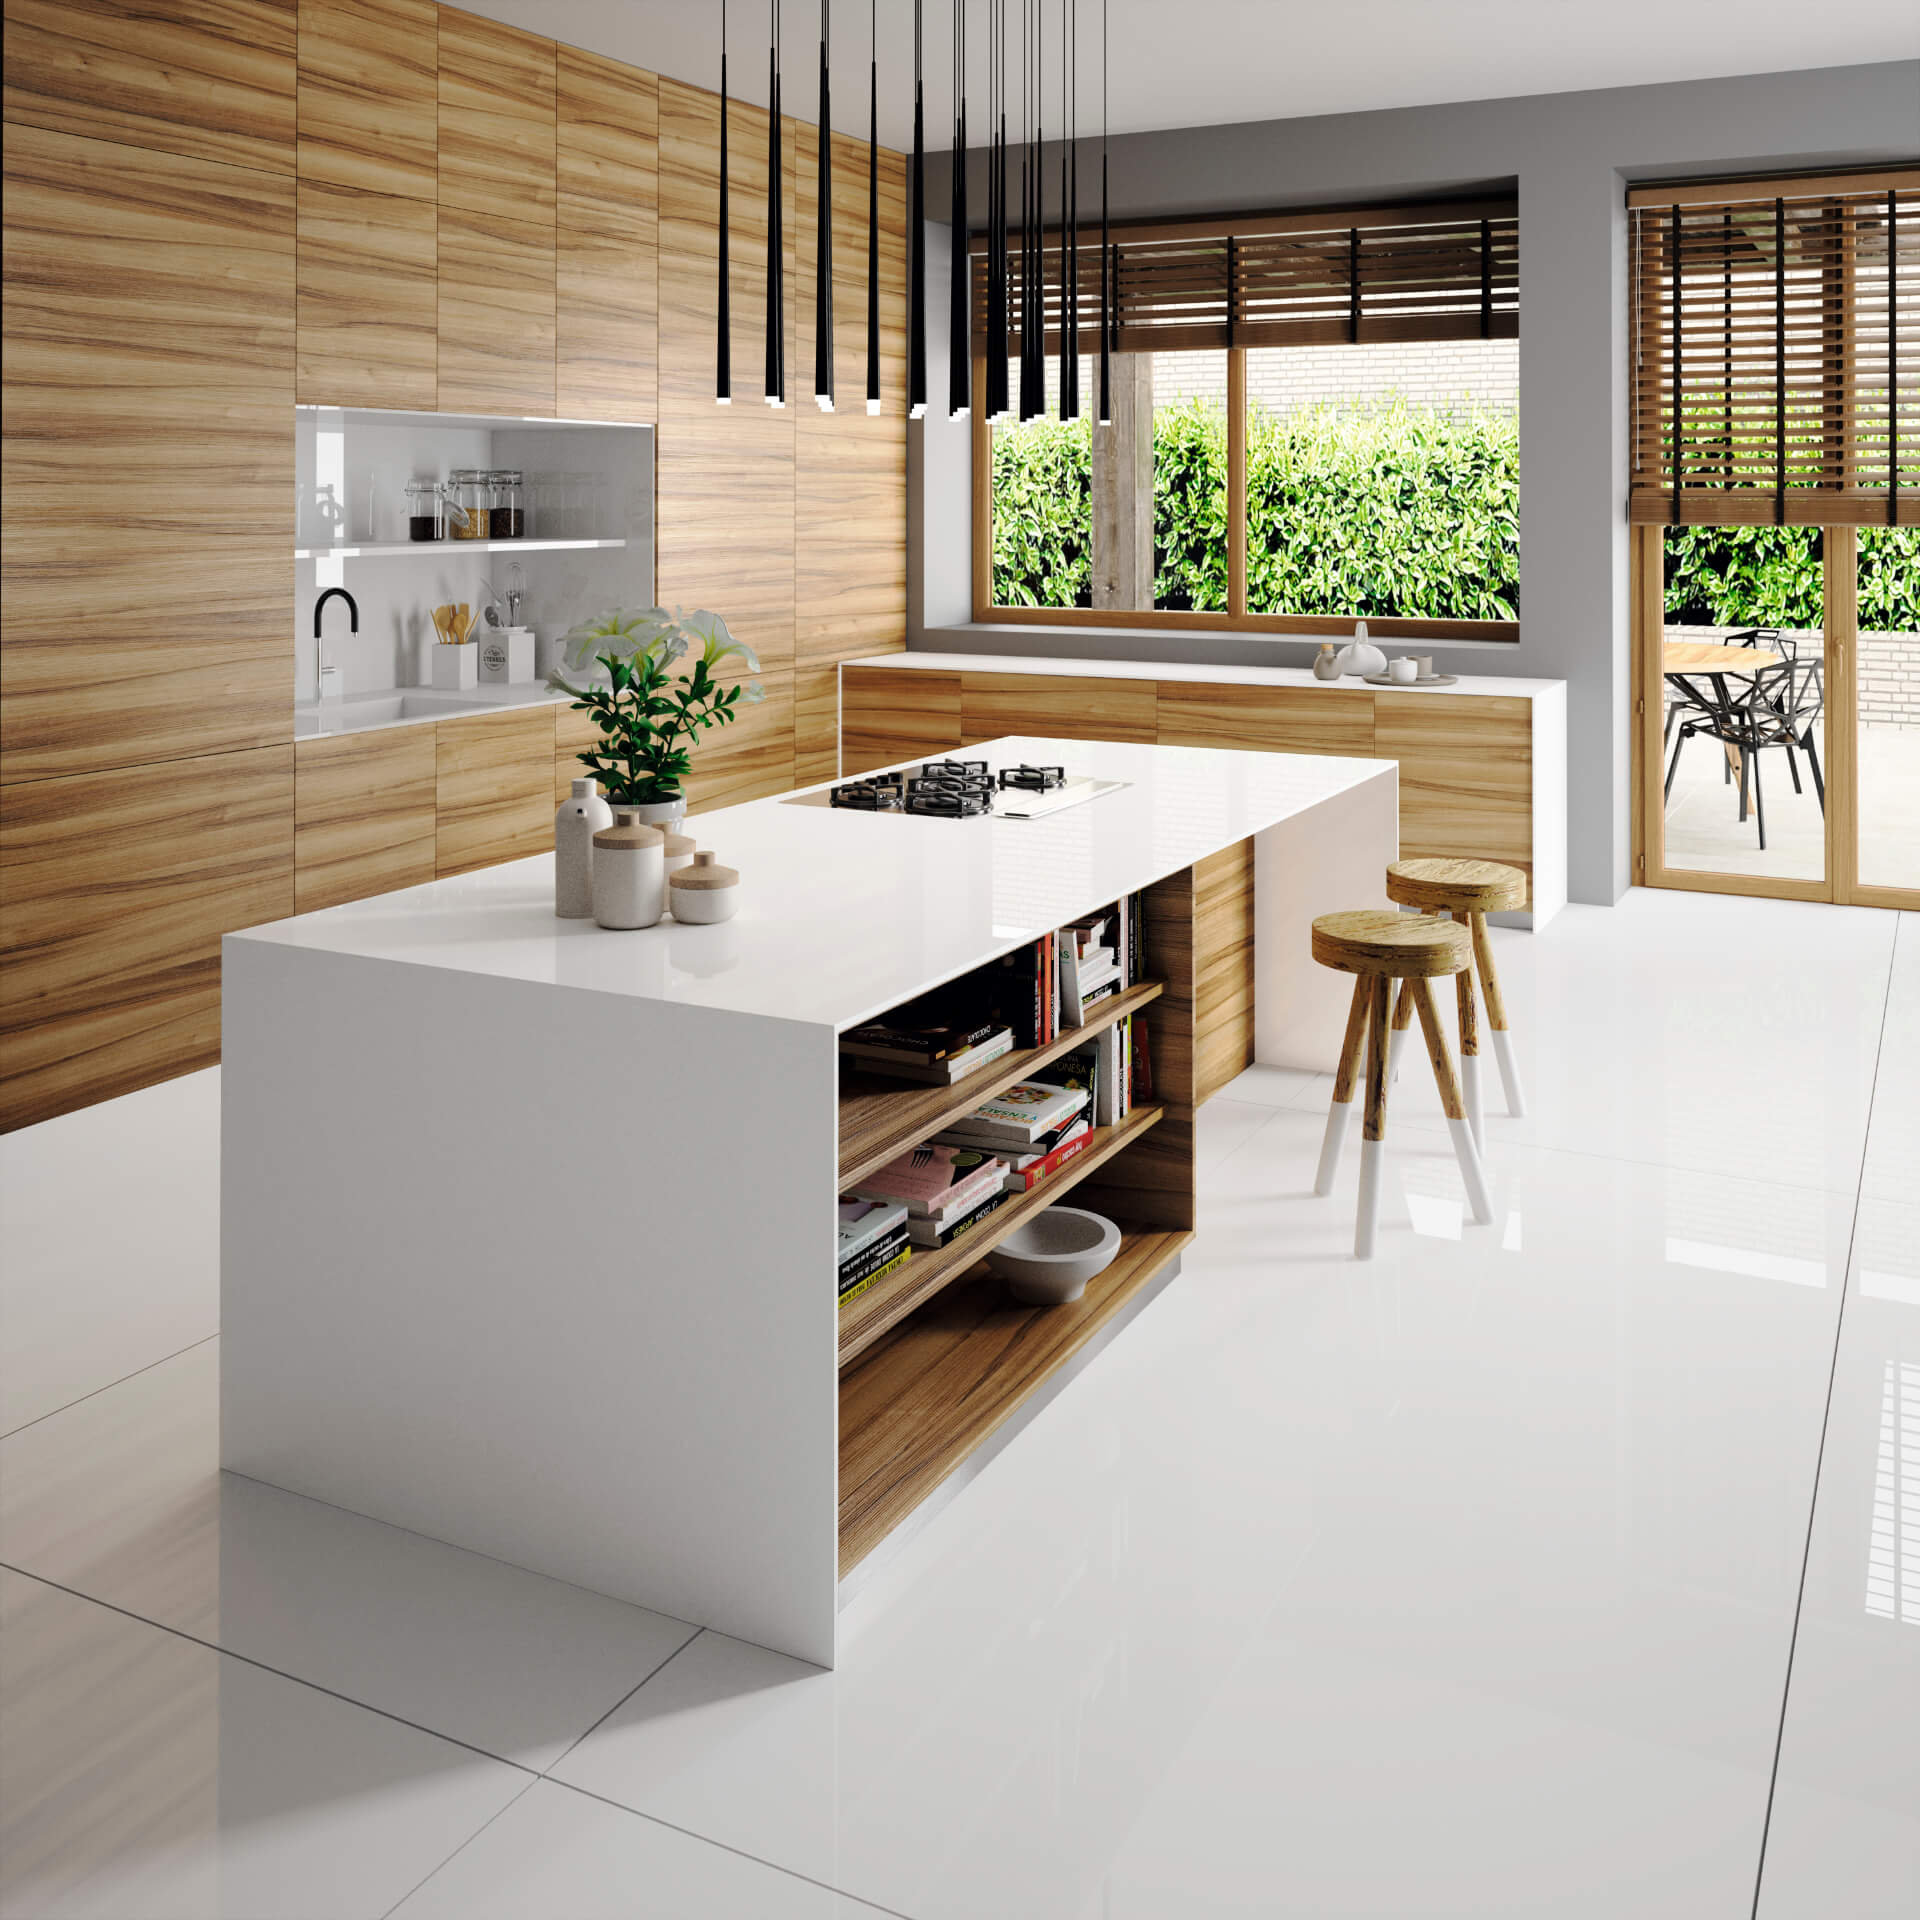 Cosentino Silestone White Wooden Kitchen